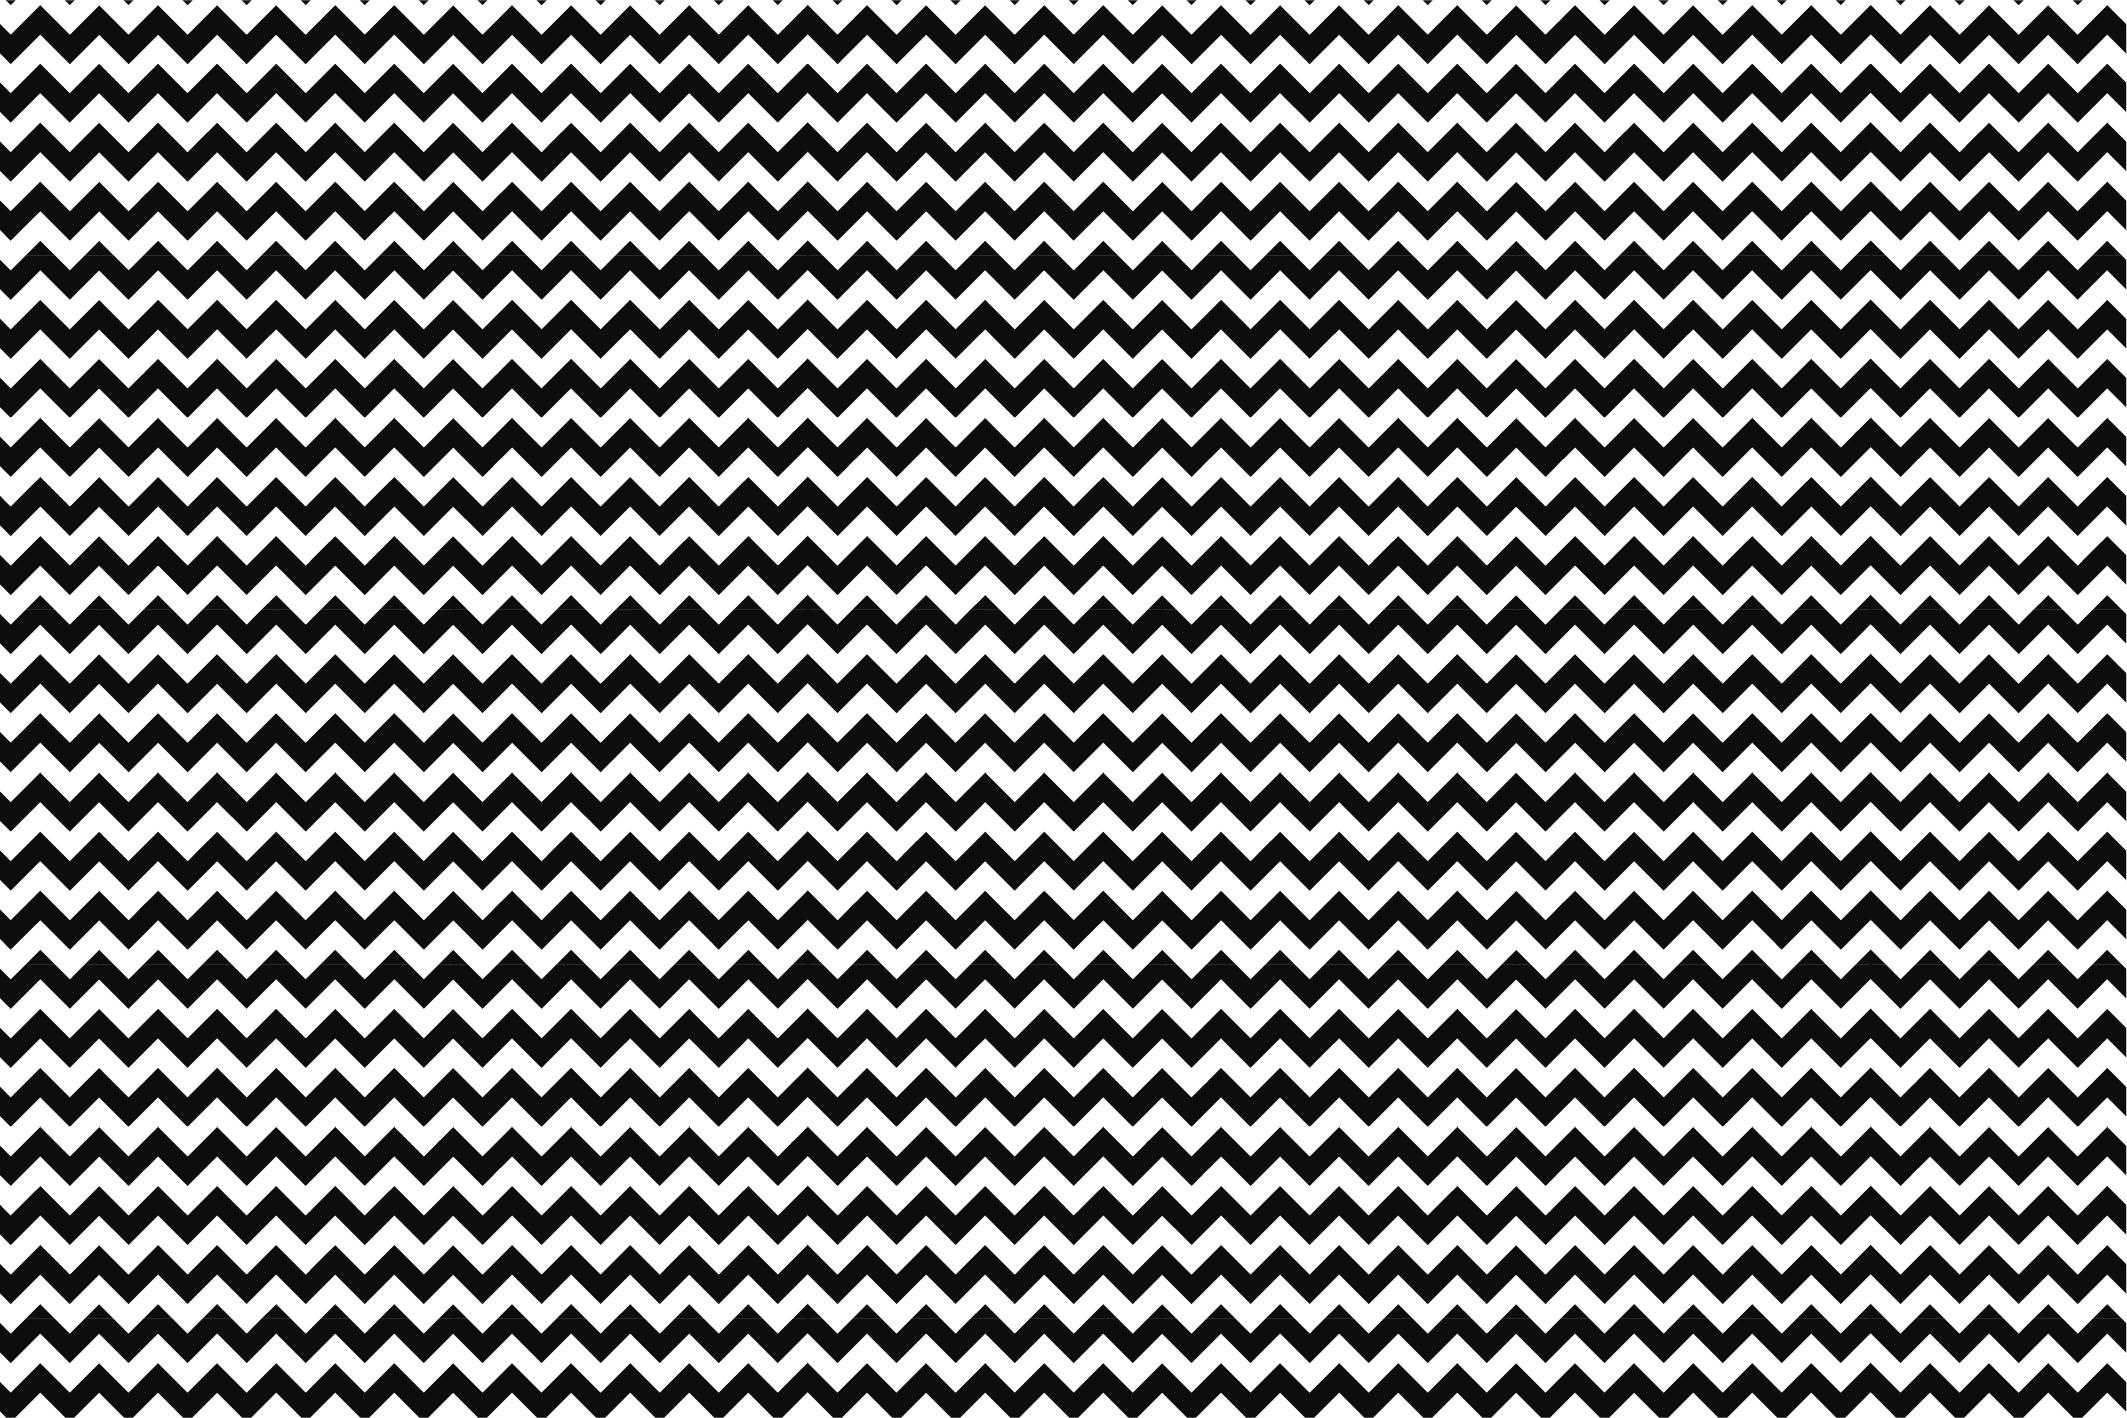 Wave&Zigzag seamless patterns. B&W. example image 12